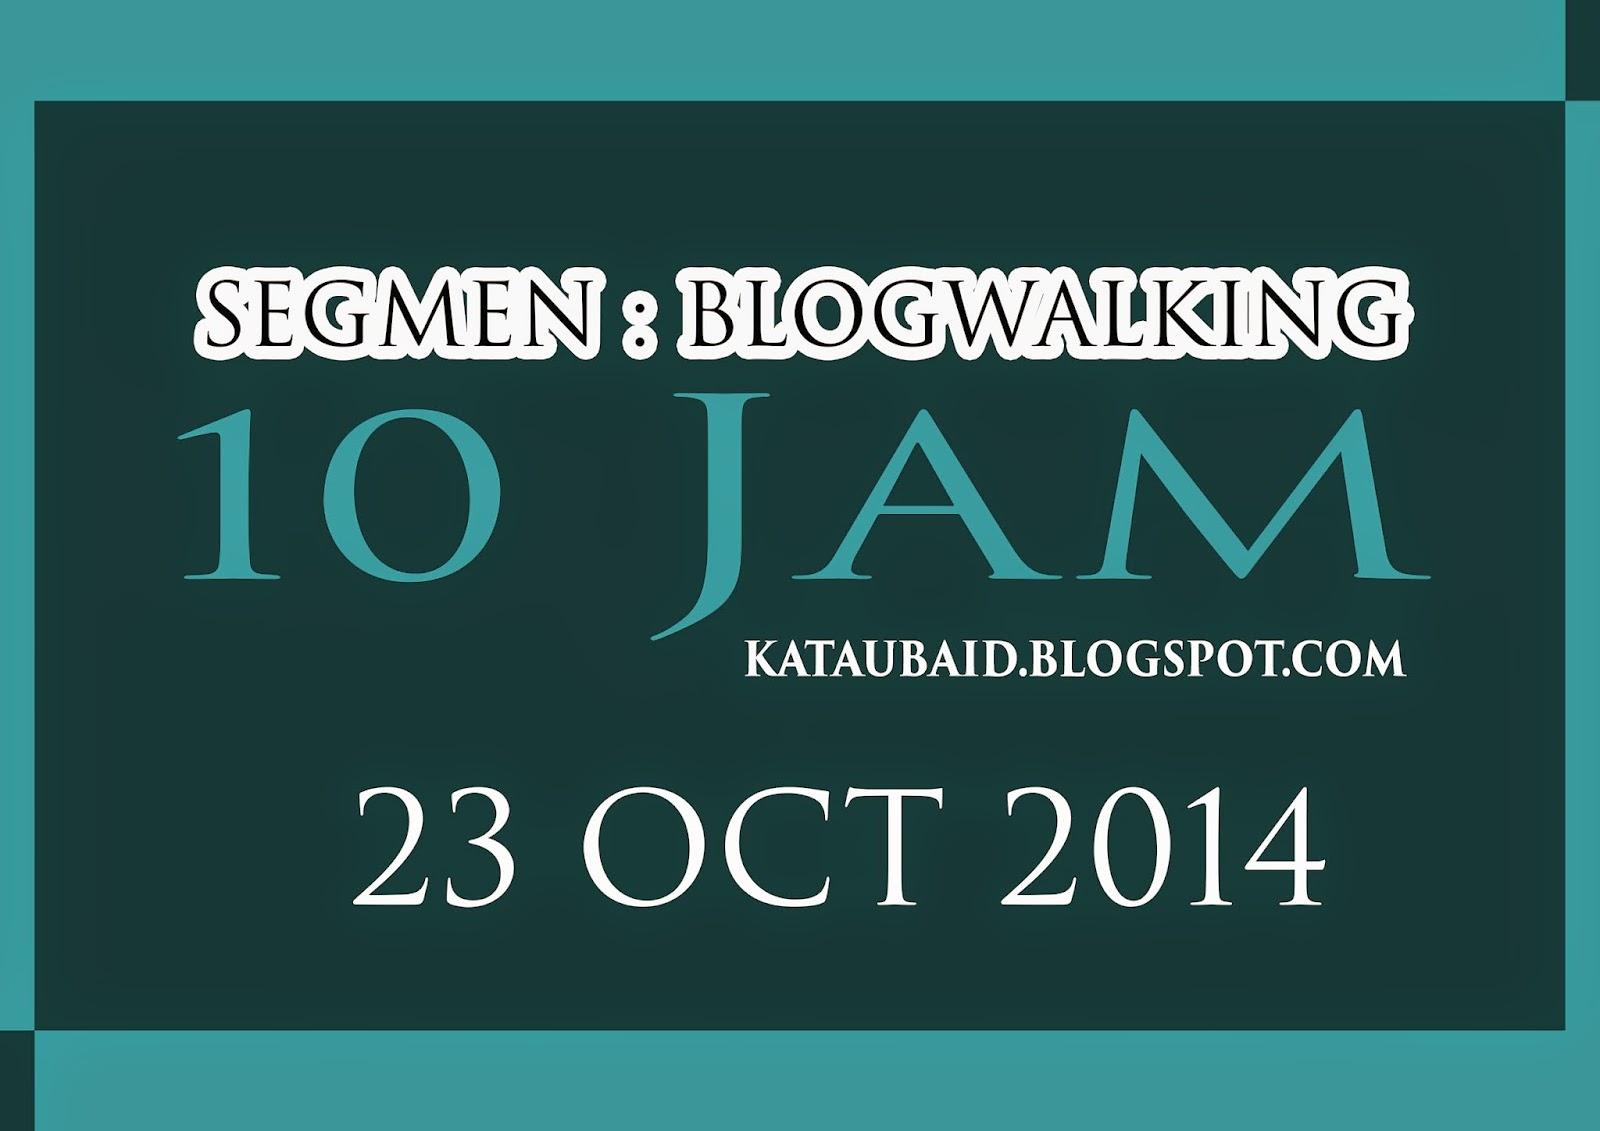 http://kataubaid.blogspot.com/2014/10/segmen-blogwalking-10-jam.html